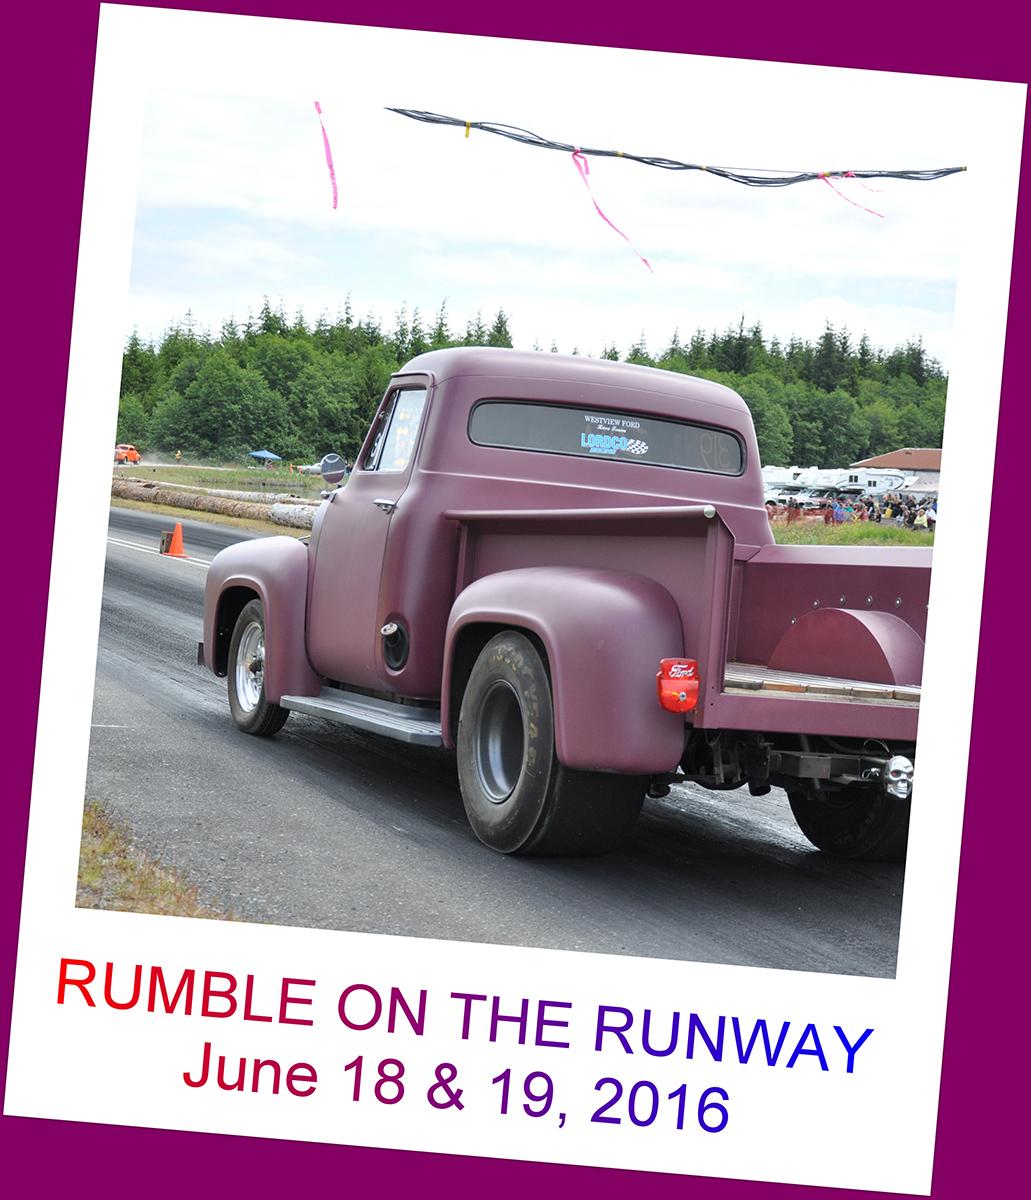 Rumble on the Runway June 18 & 19, 2016 570